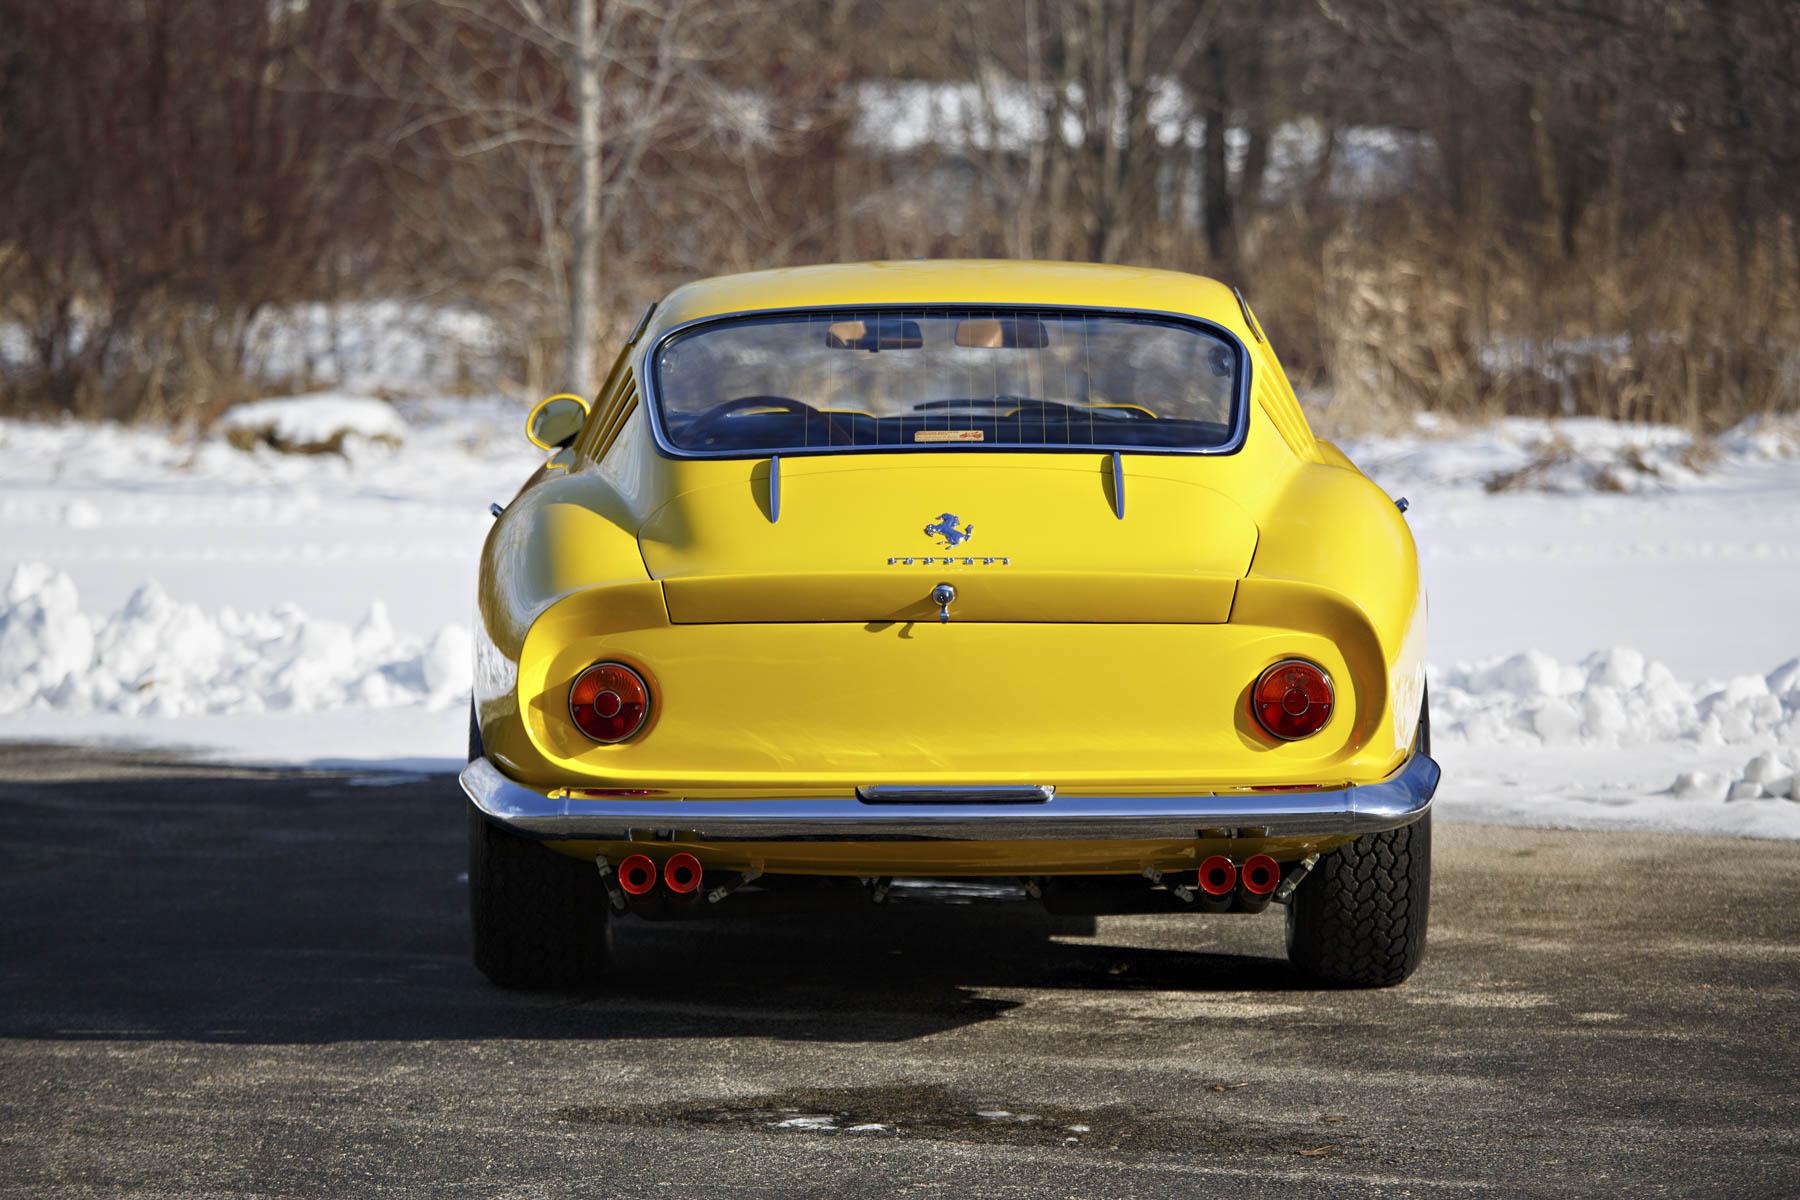 1964 Ferrari 275 GTB Prototype rear